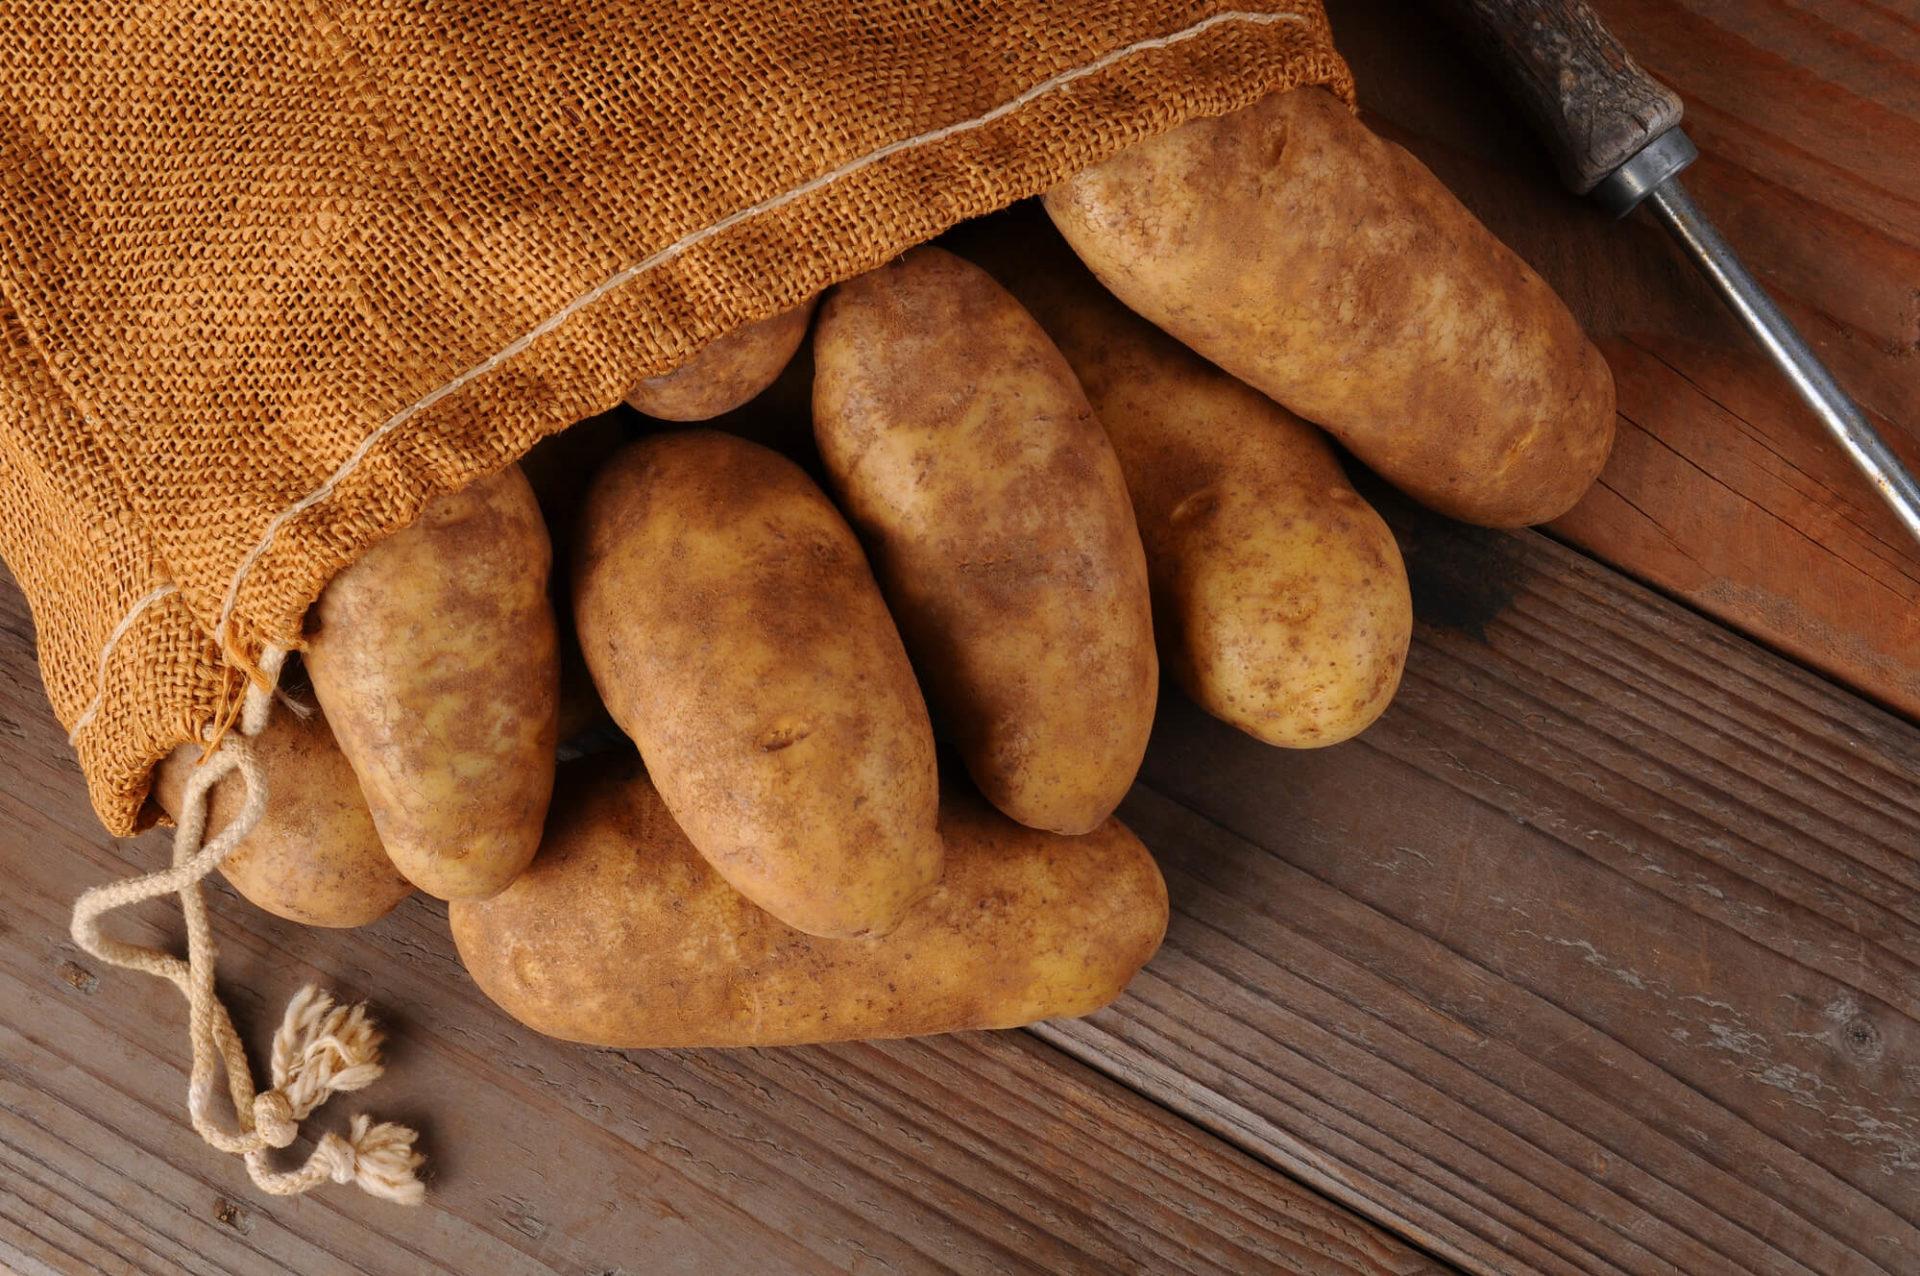 Wada Farms: Year-Round Organic Potatoes